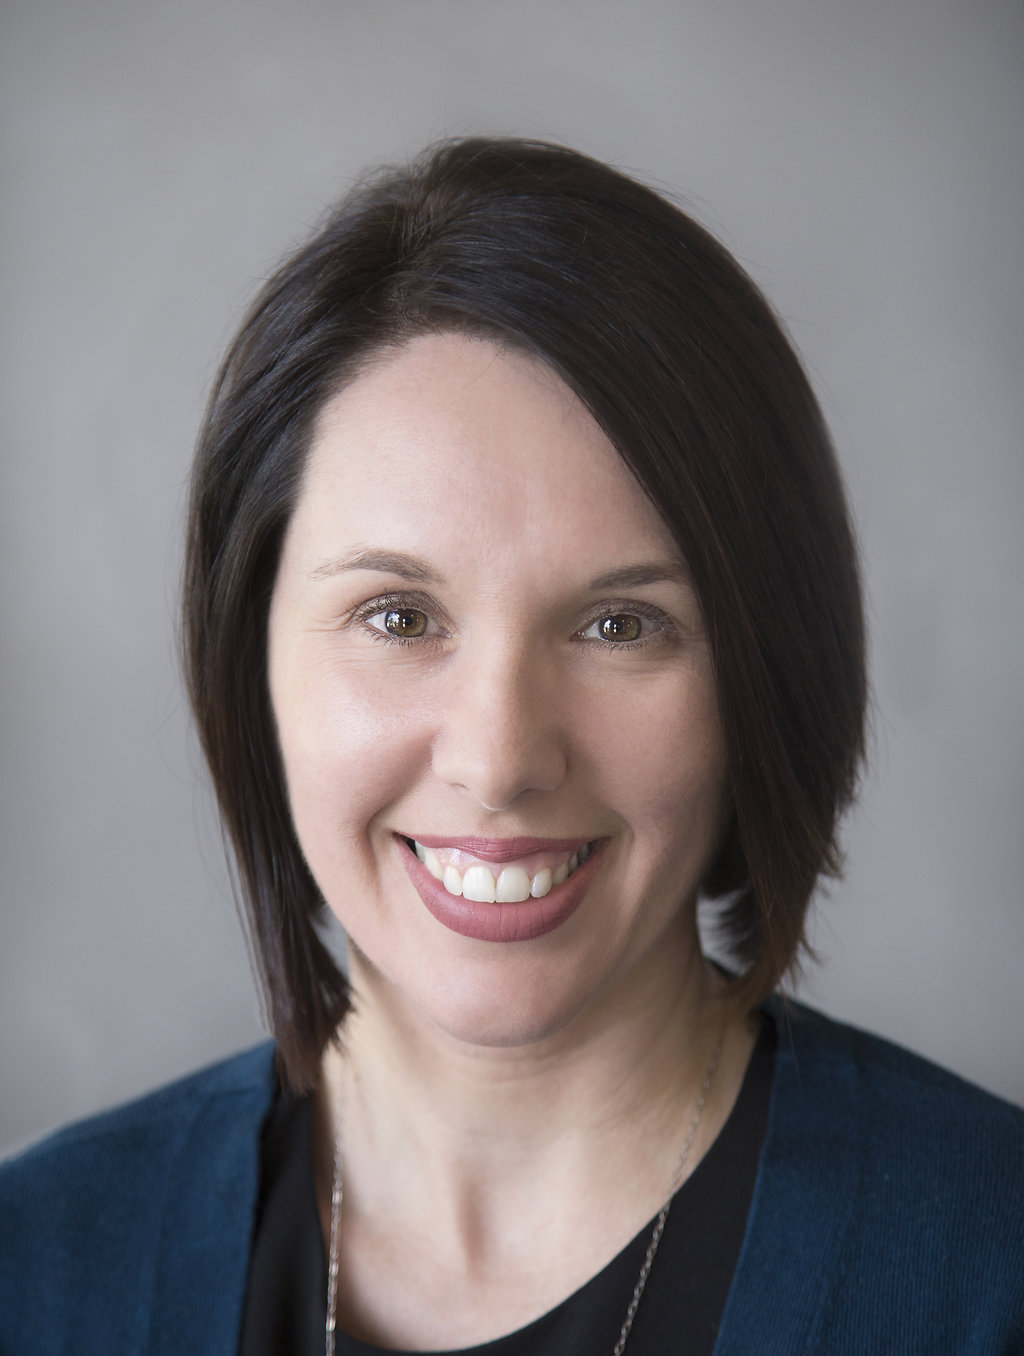 Kristen Conley